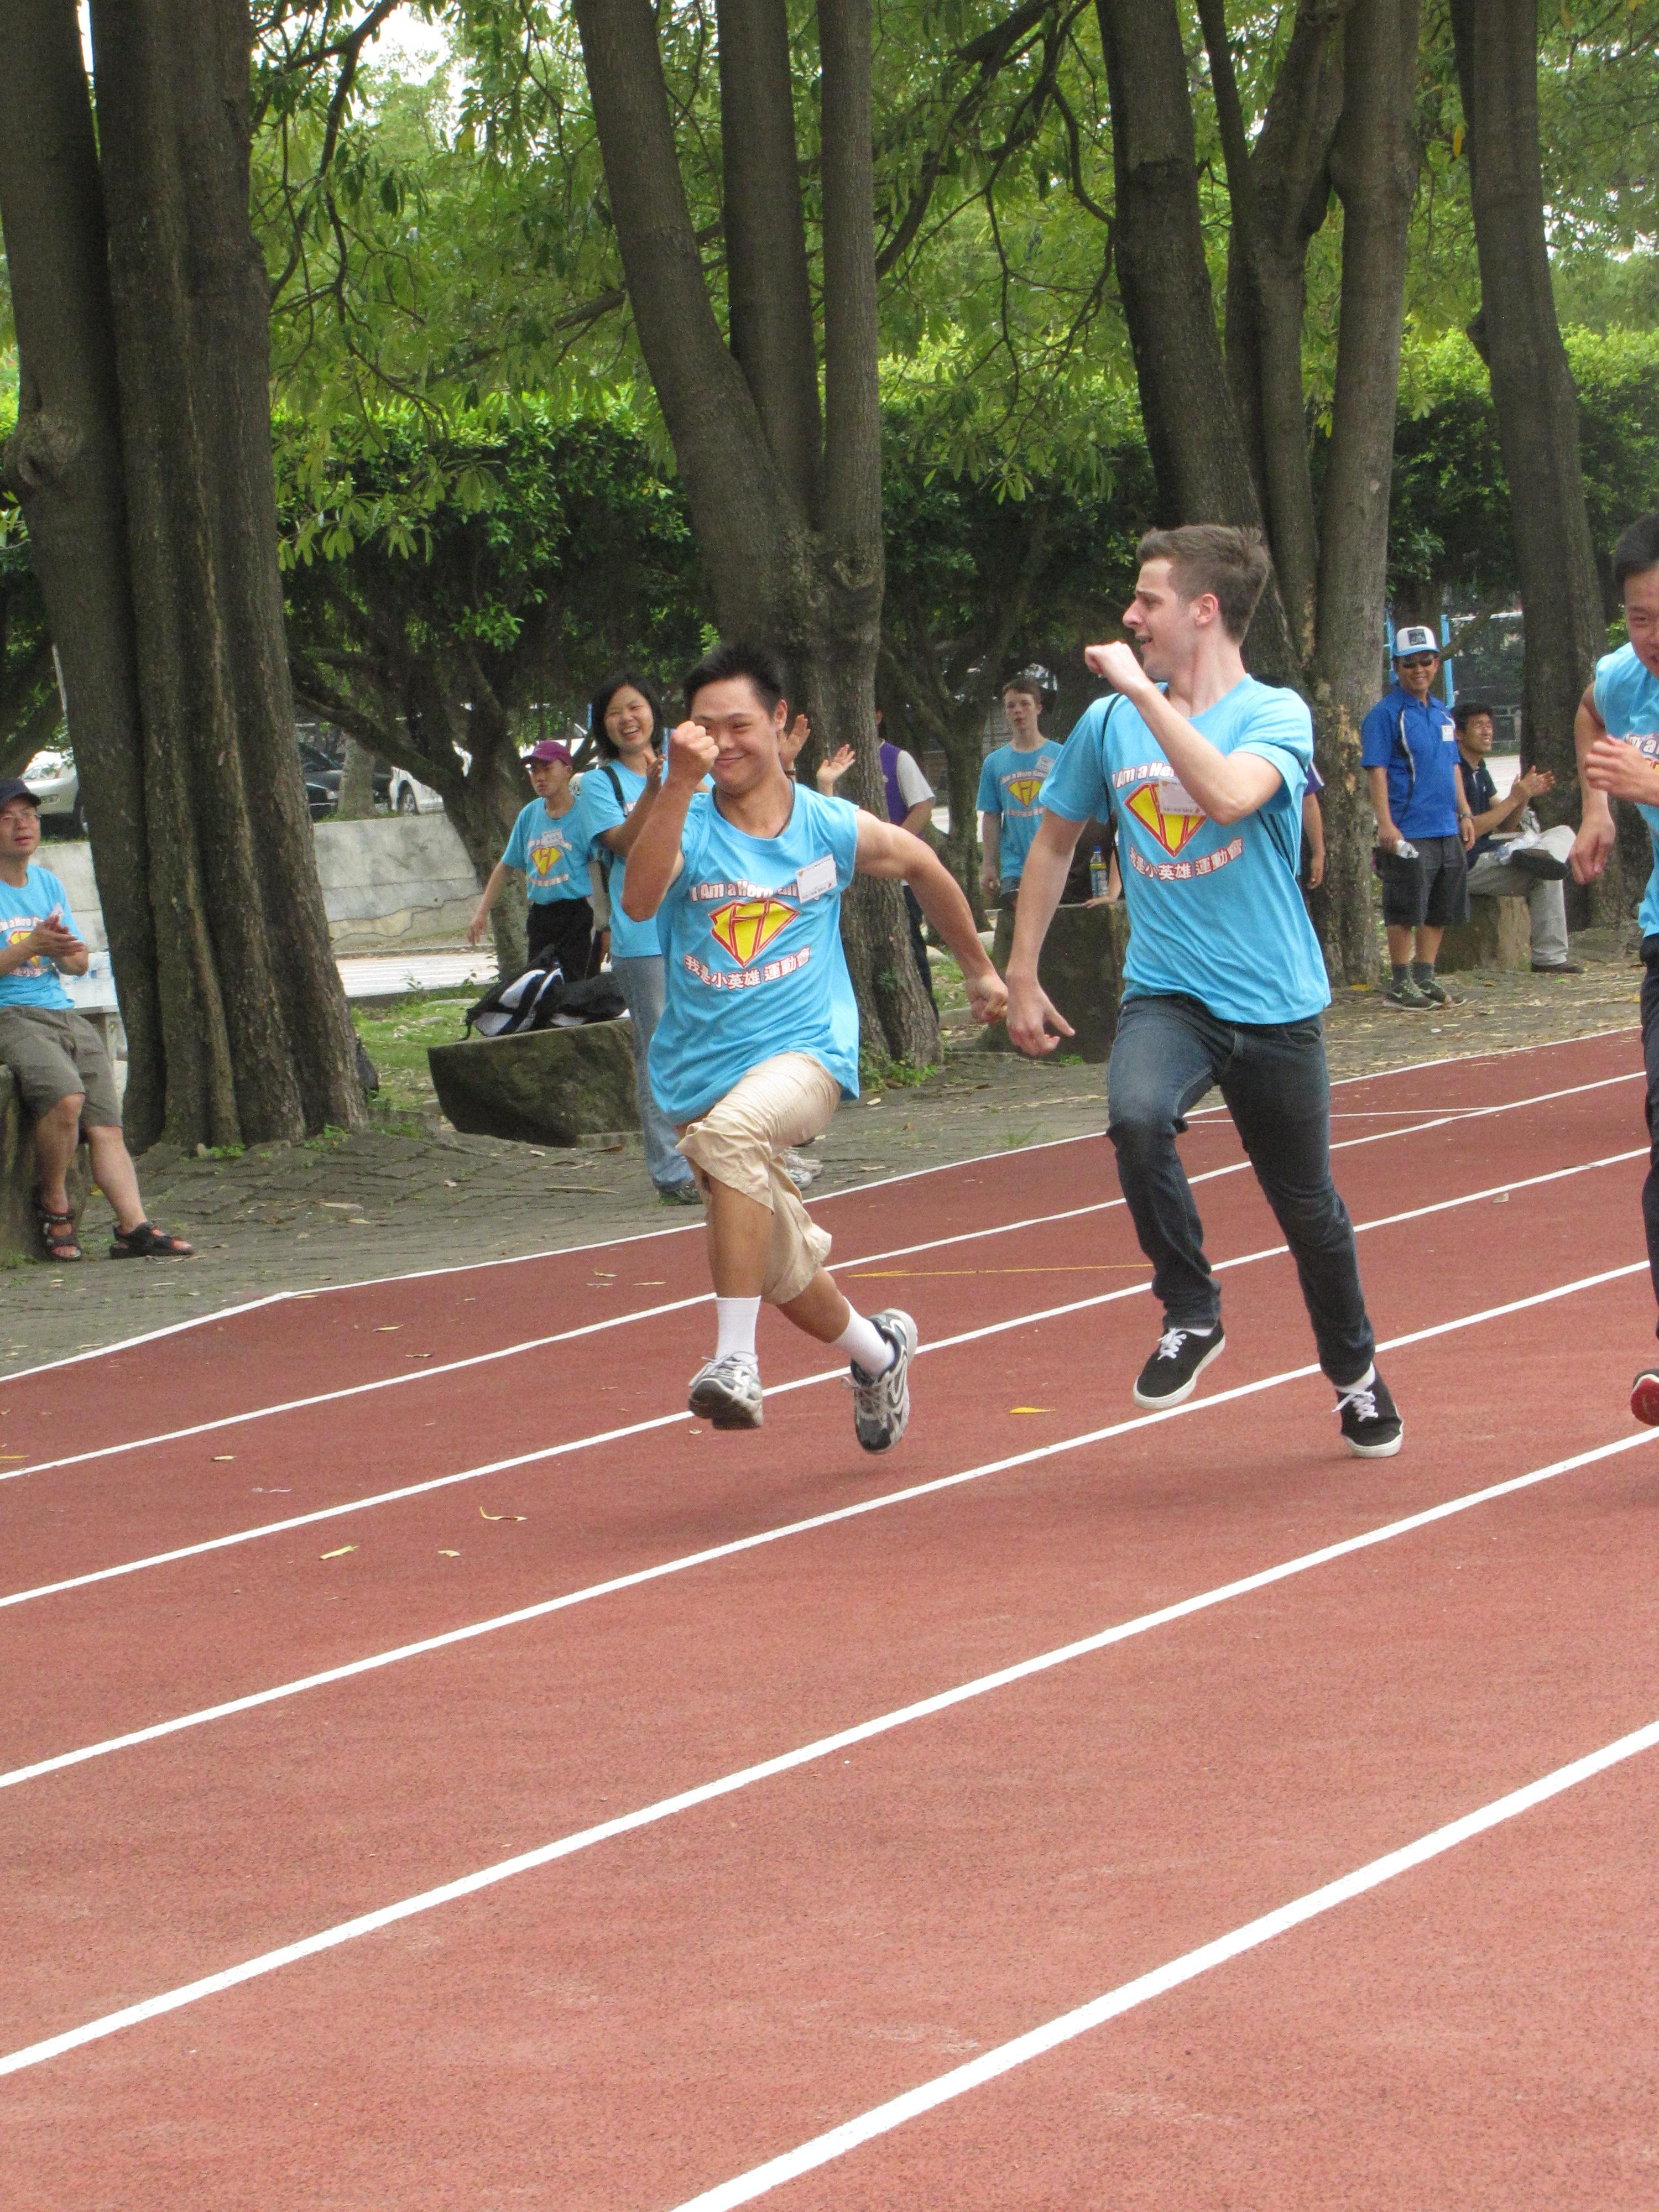 Dashing to the finish line!